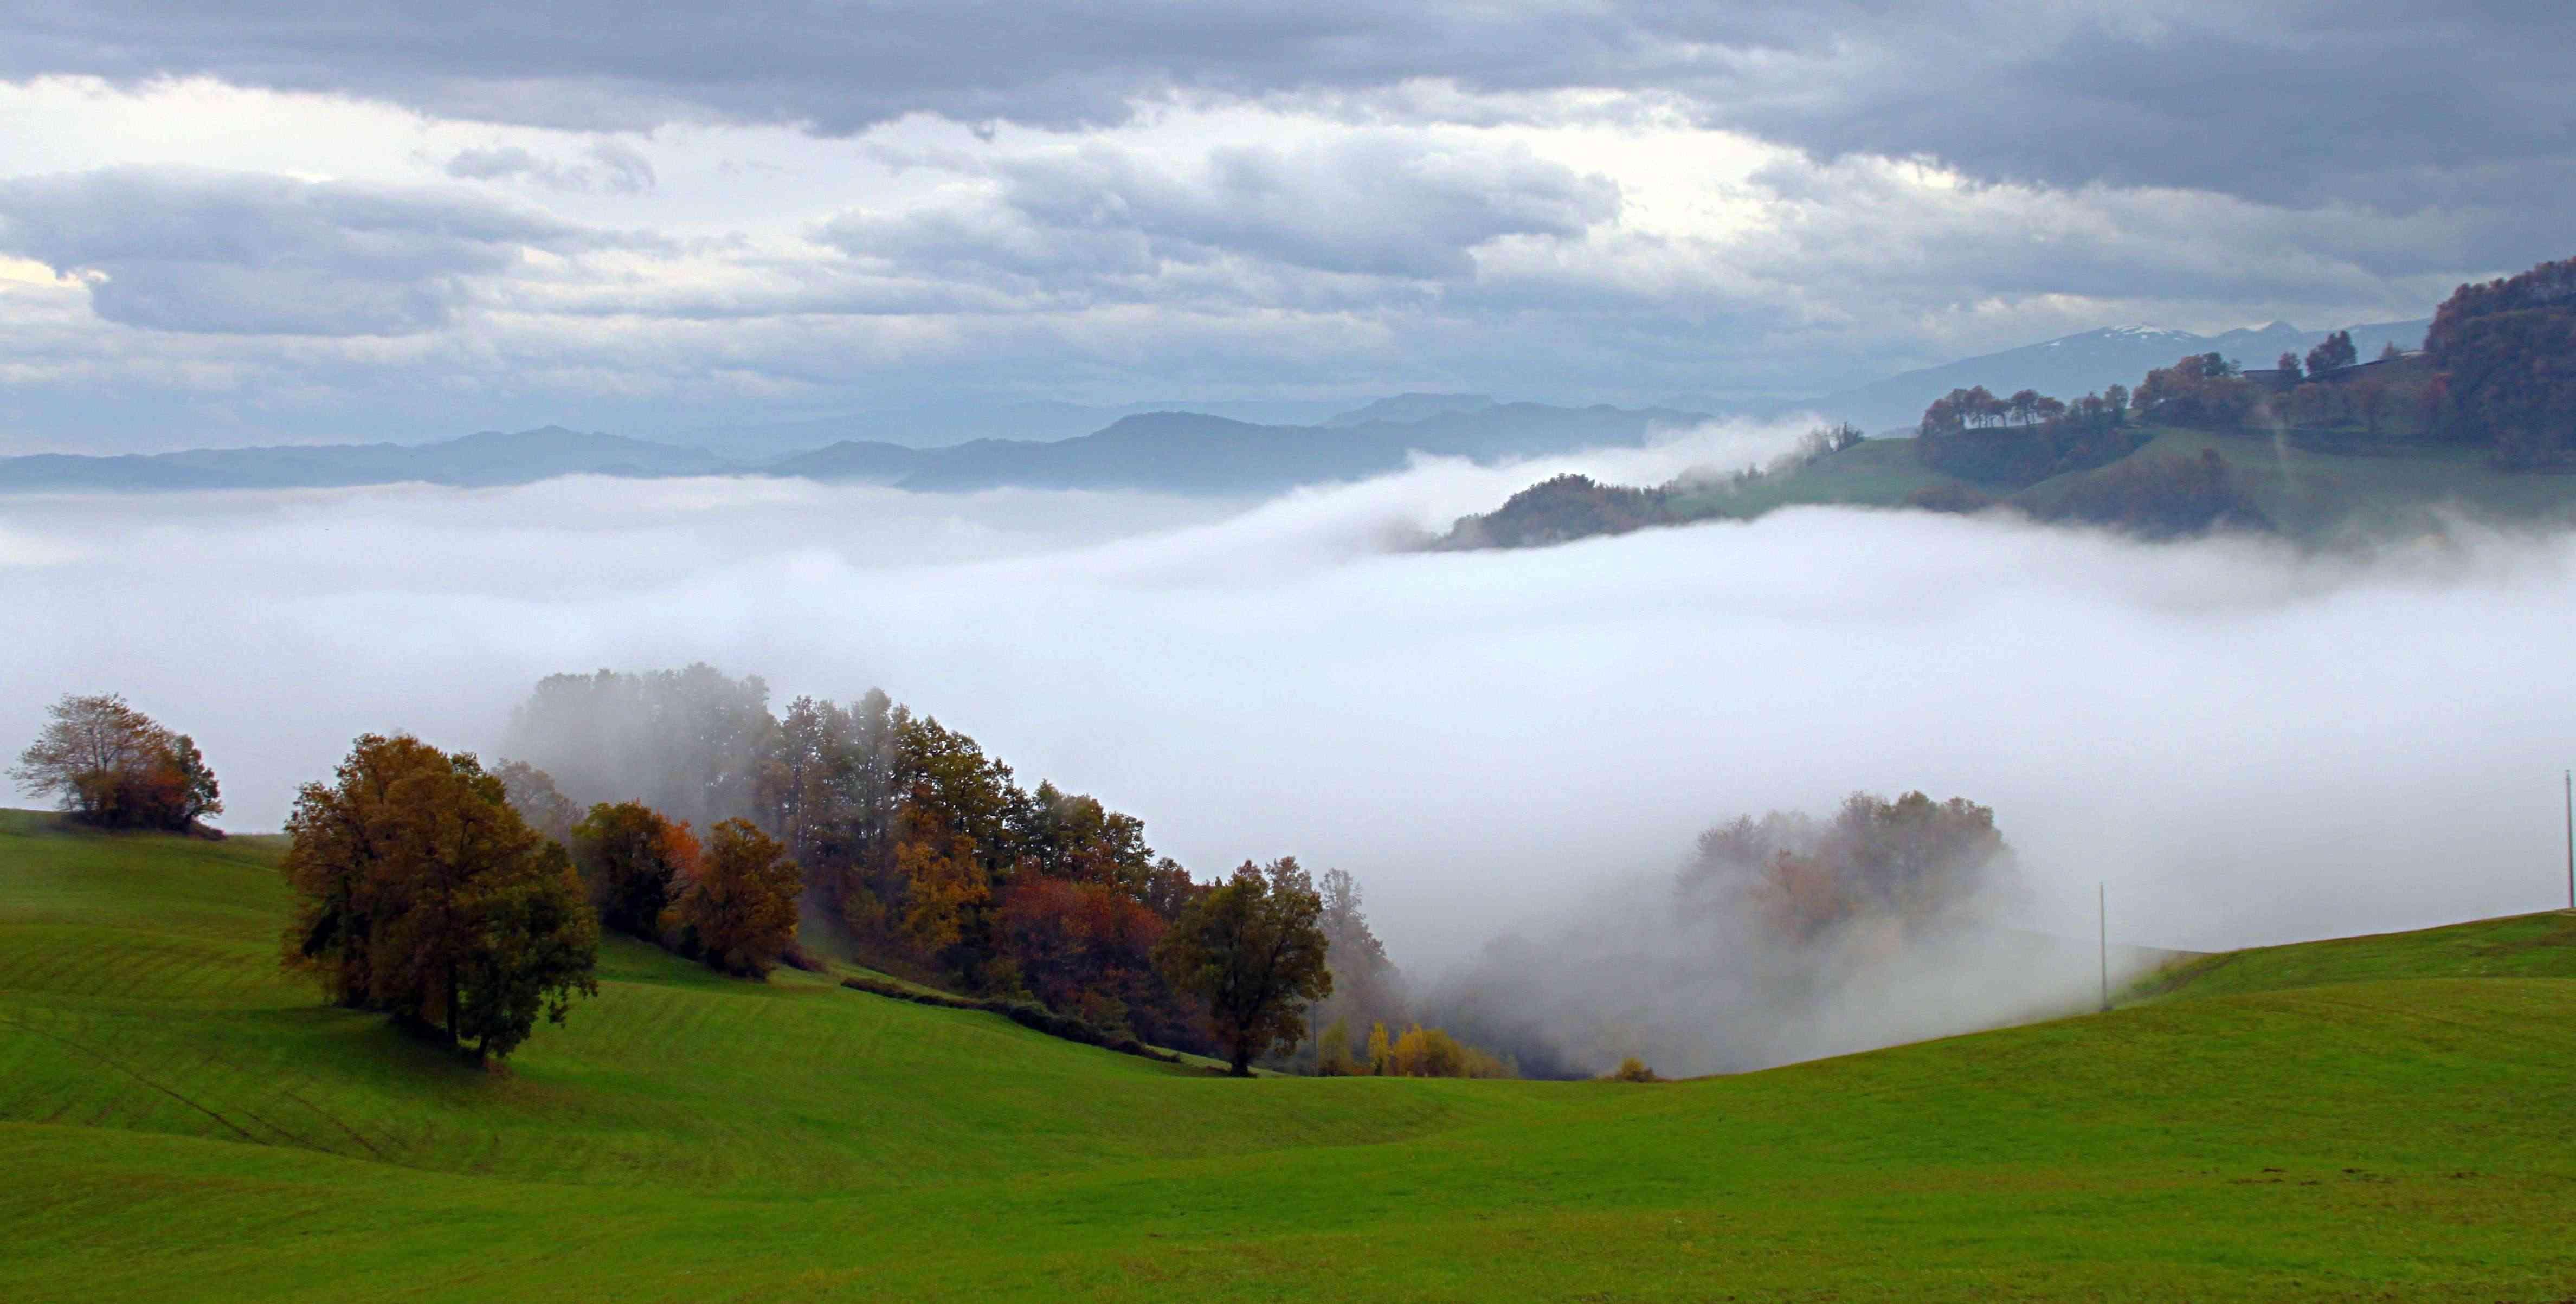 La nebbia piovigginando sale Img_8710